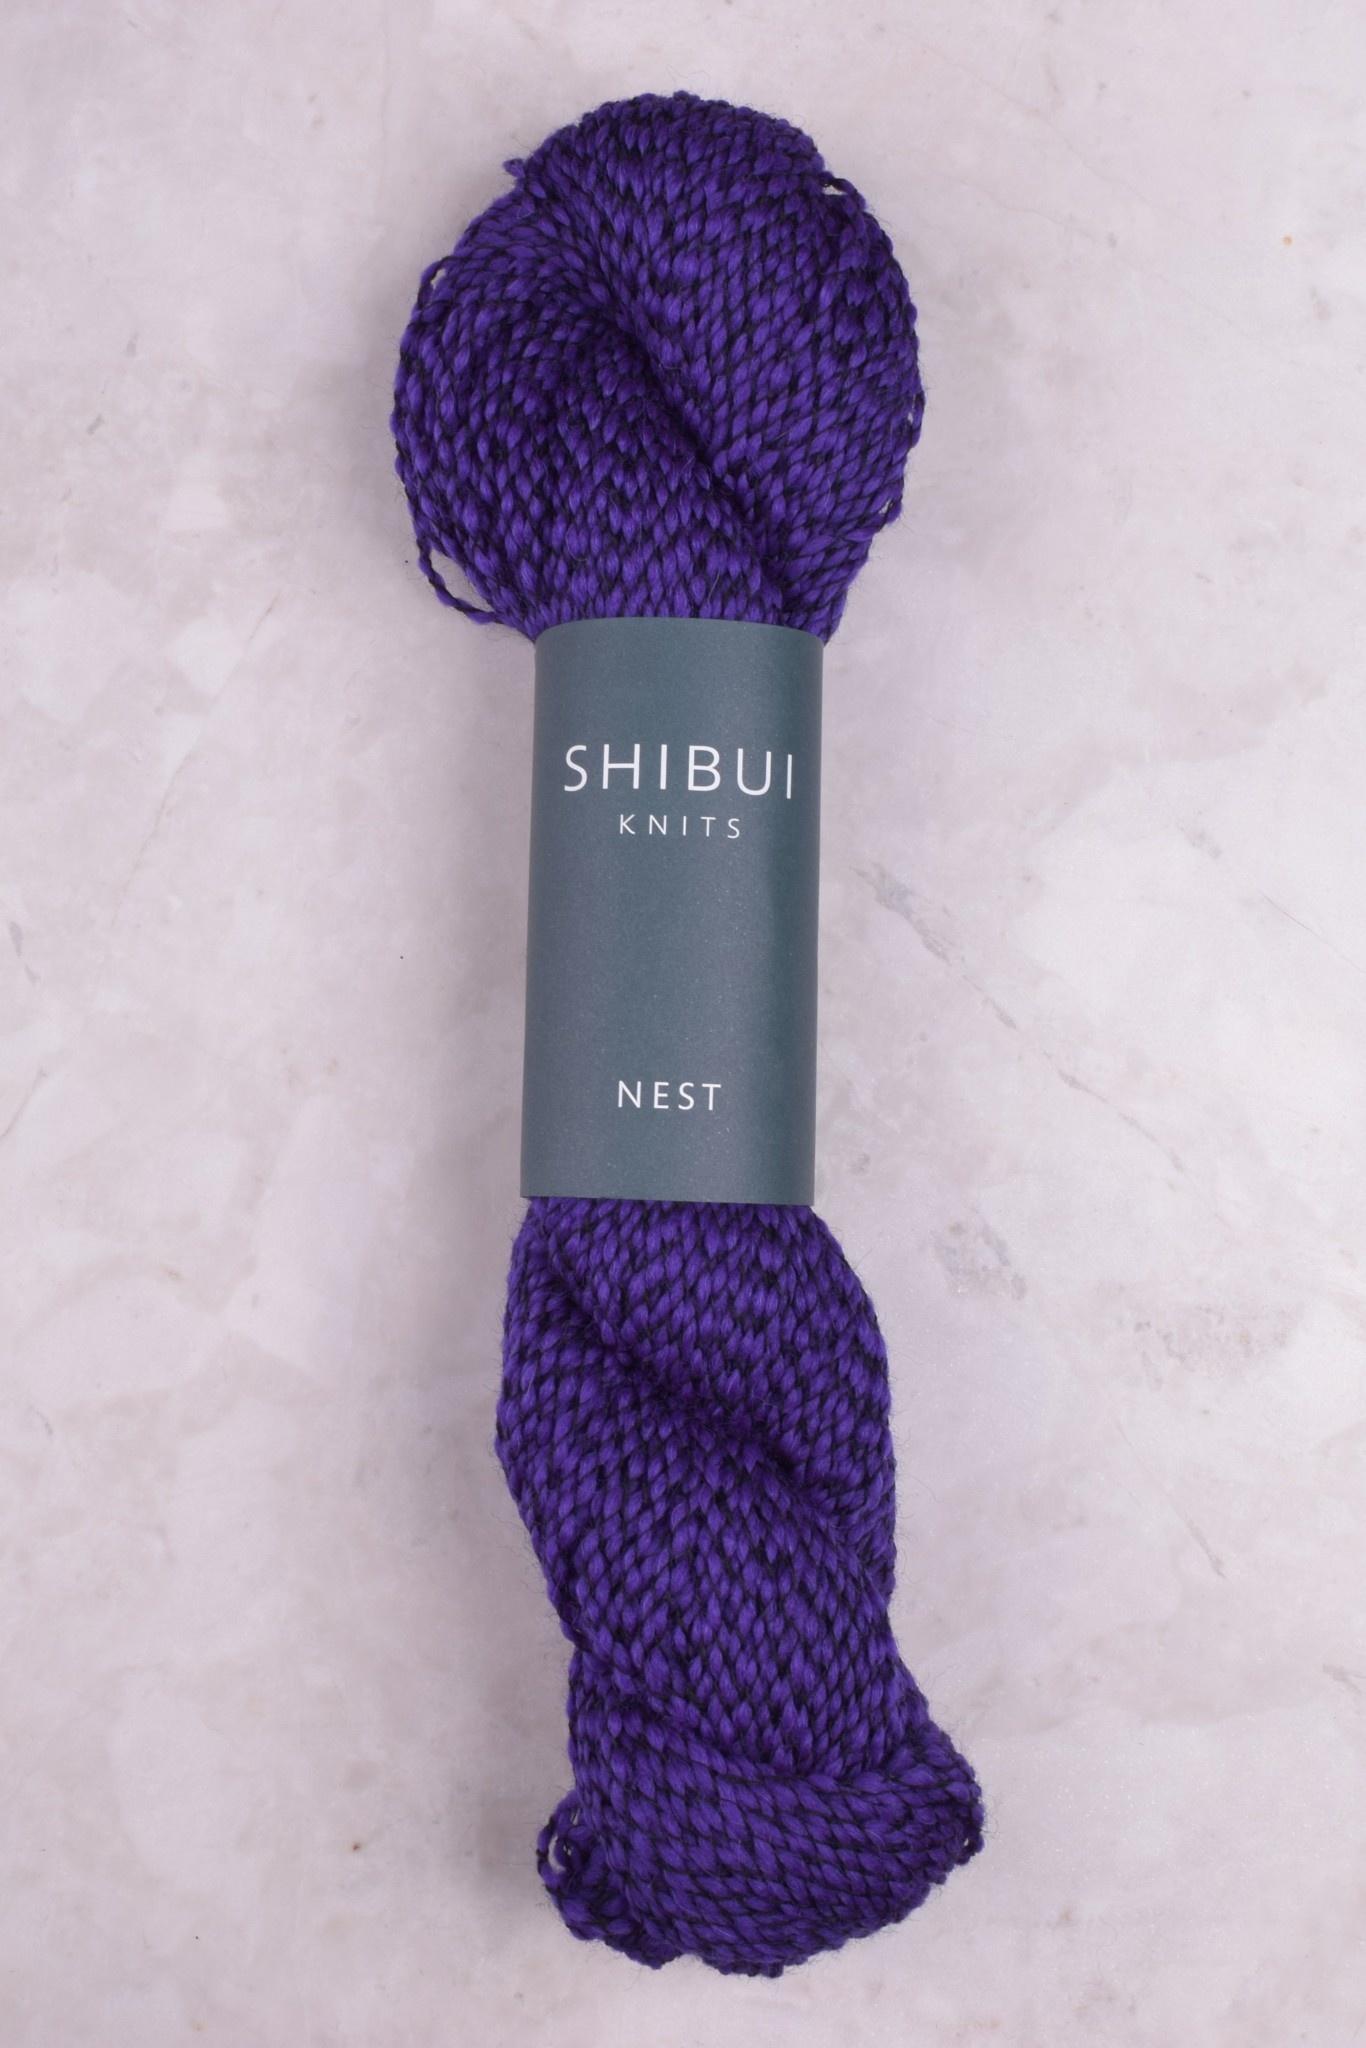 Image of Shibui Nest 2197 Tyrian (Limited Edition)